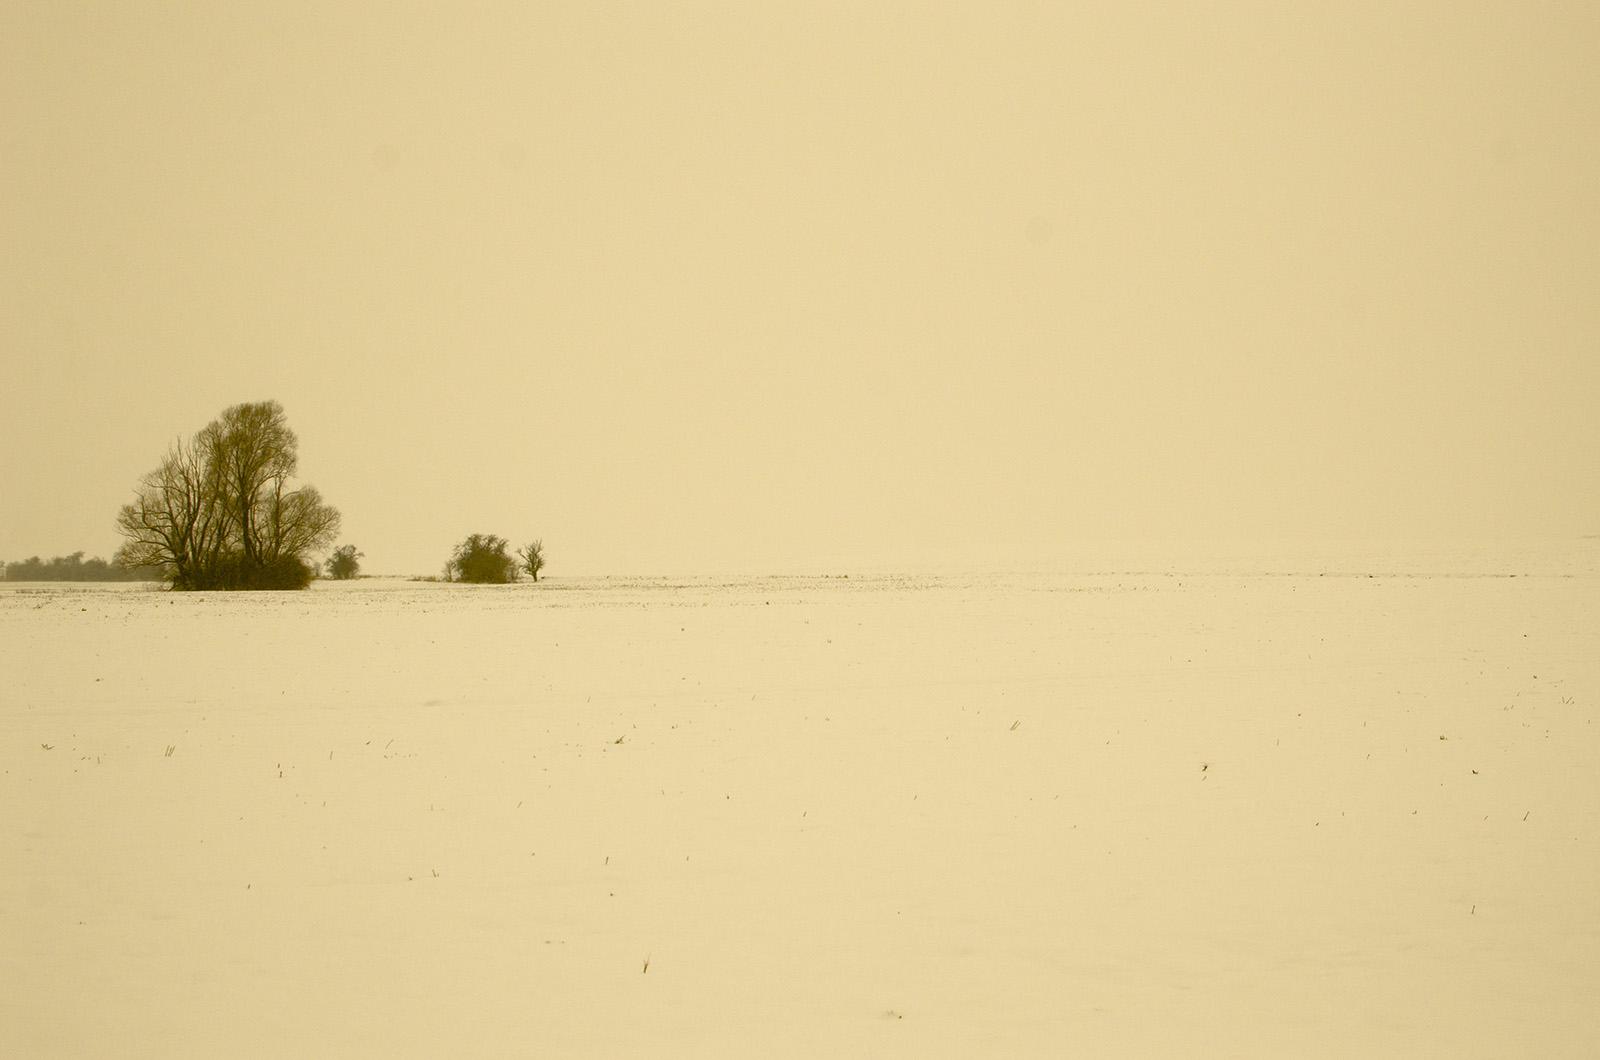 """Země nikoho"" ze série Nostalgická zima"